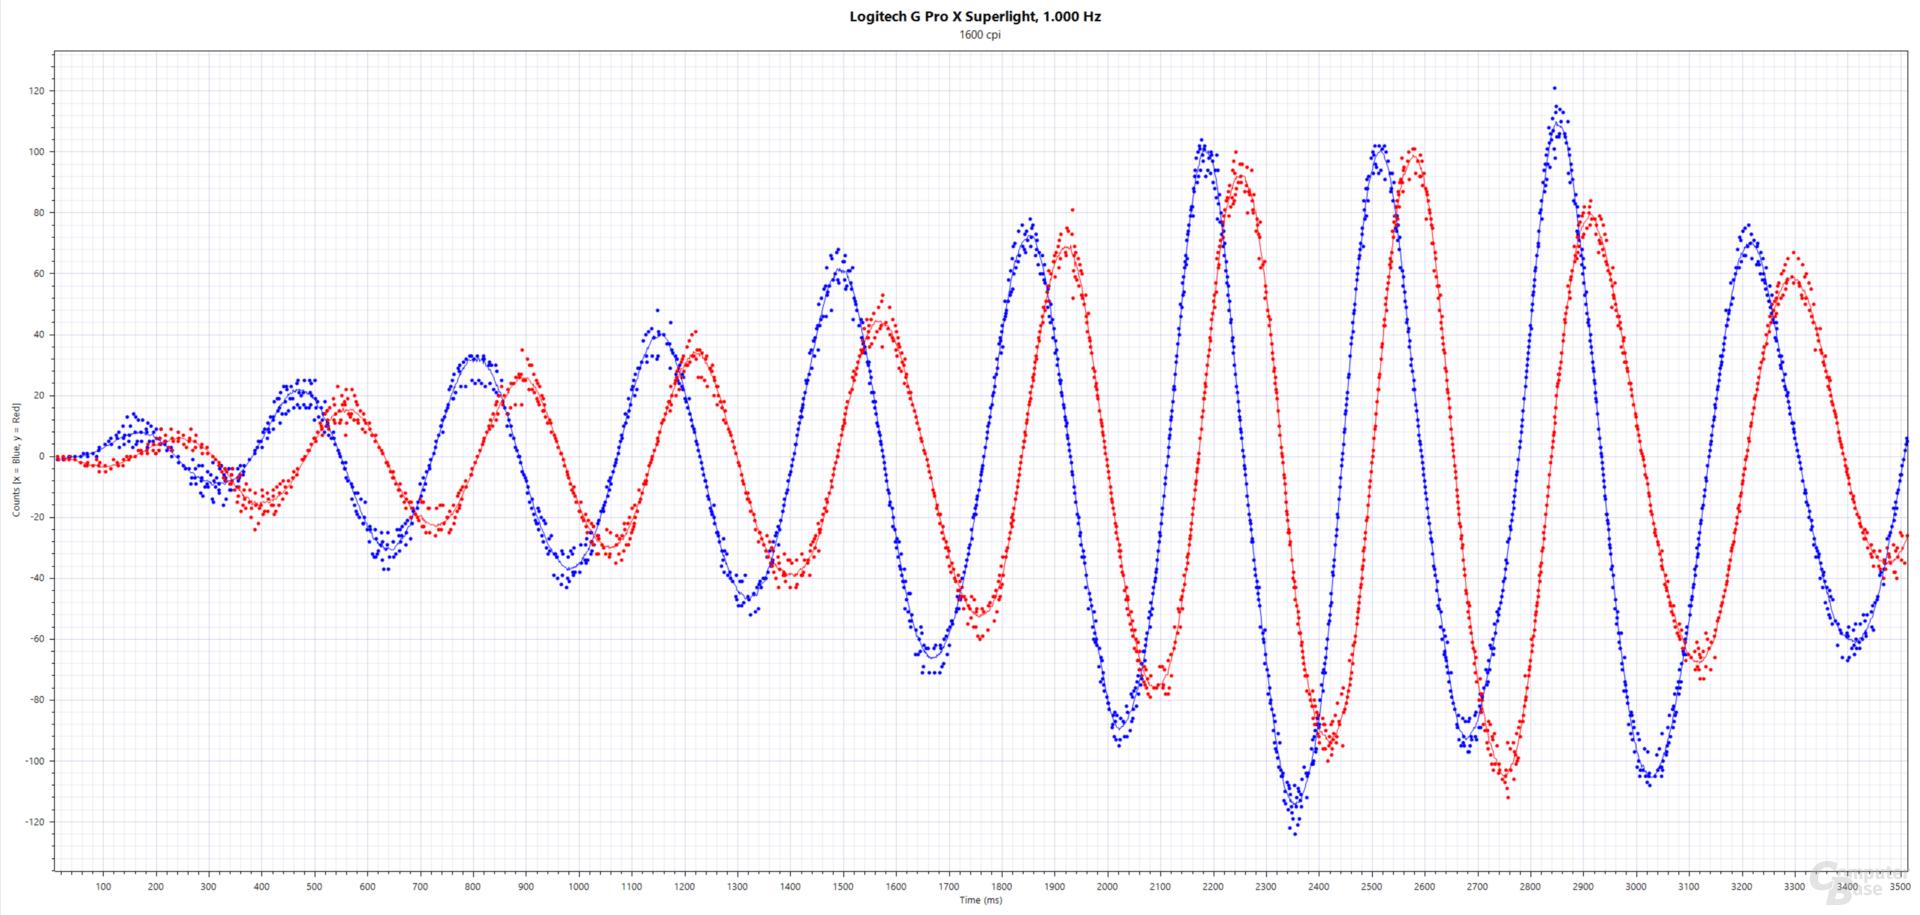 Blau: xCounts(ms), Rot: yCounts(ms); Logitech G Pro X Superlight (Logitech Hero, 1.600 cpi, 1.000 Hertz, Stoffmauspad)